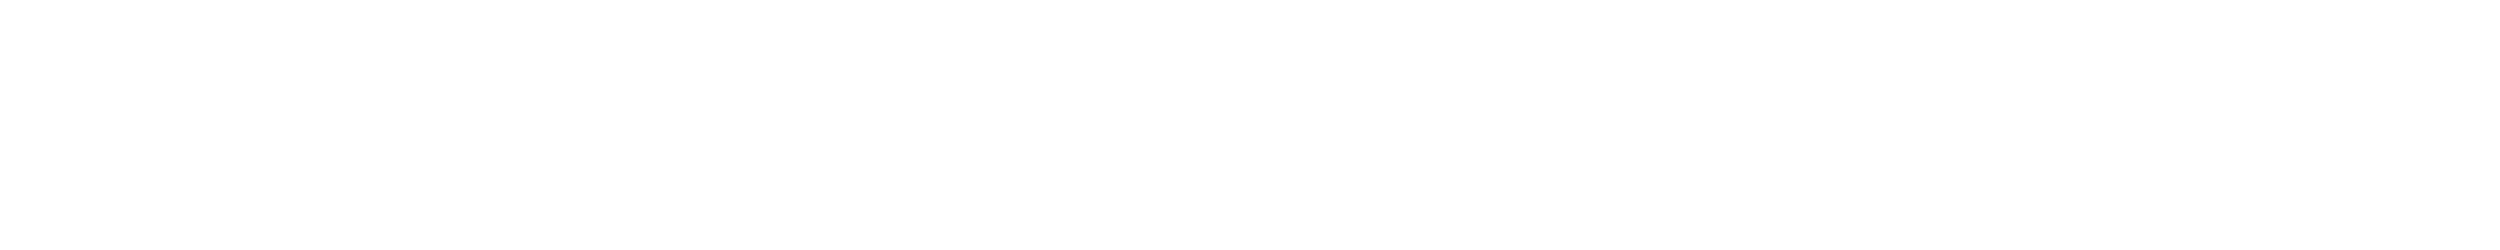 DESIGN+BANNER (1) white.png